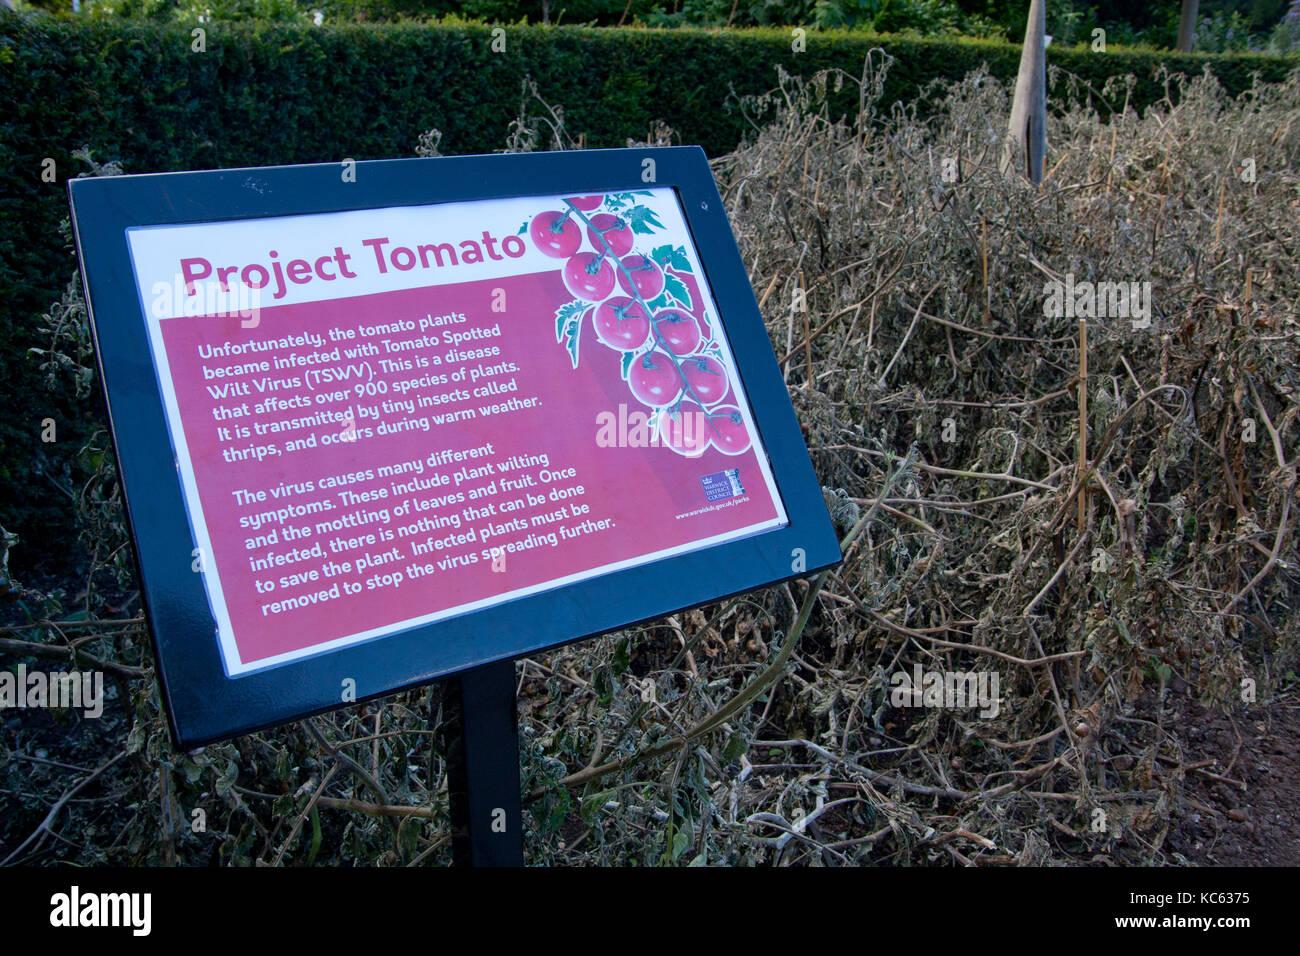 Projekt Tomate, Tomaten von Tomato spotted wilt Virus infiziert (TSWV) verursacht durch Thrips Stockbild